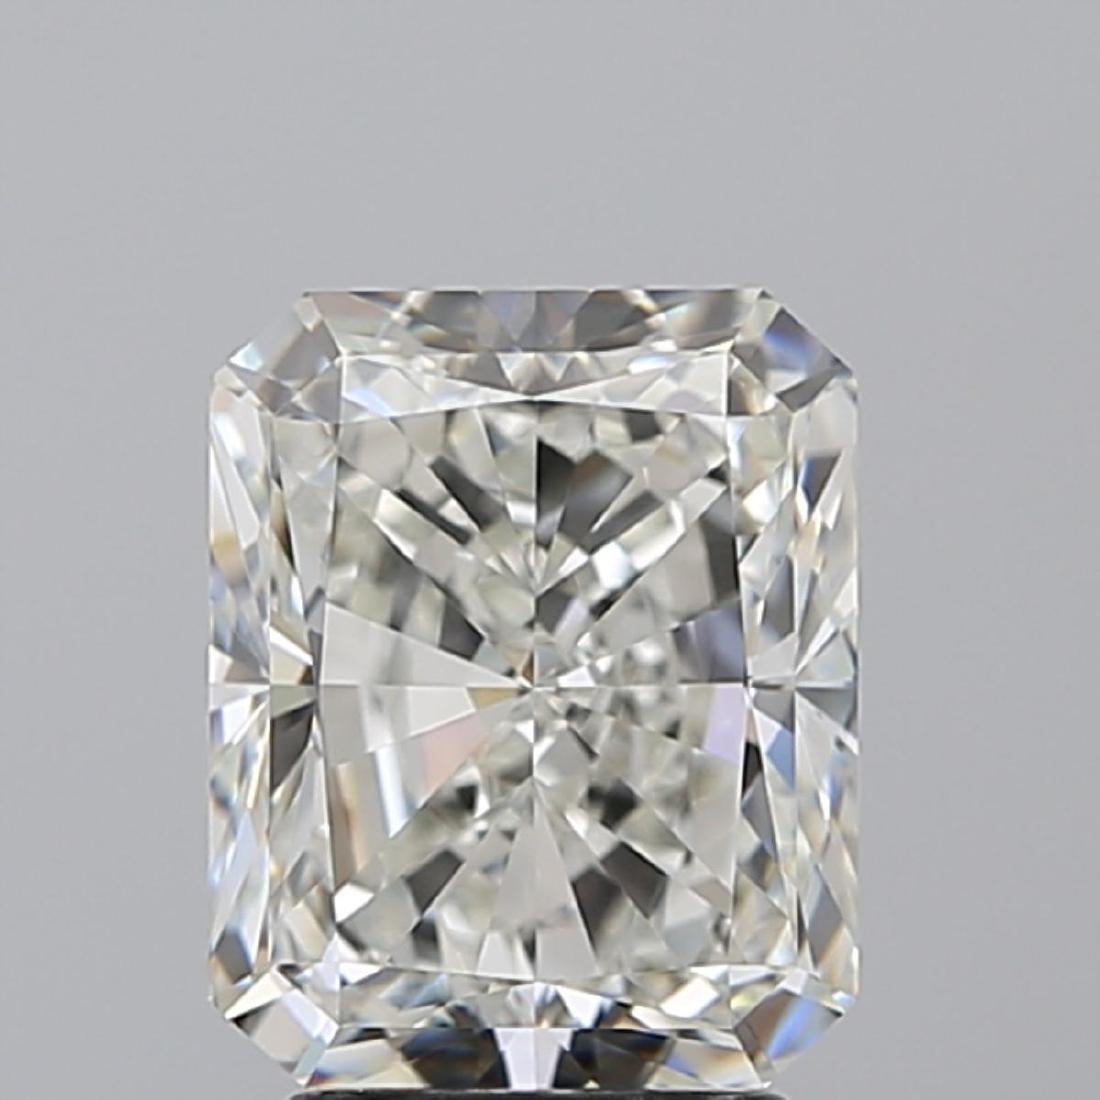 3.02 ct, Color I/VVS2 , Radiant cut Diamond - 2